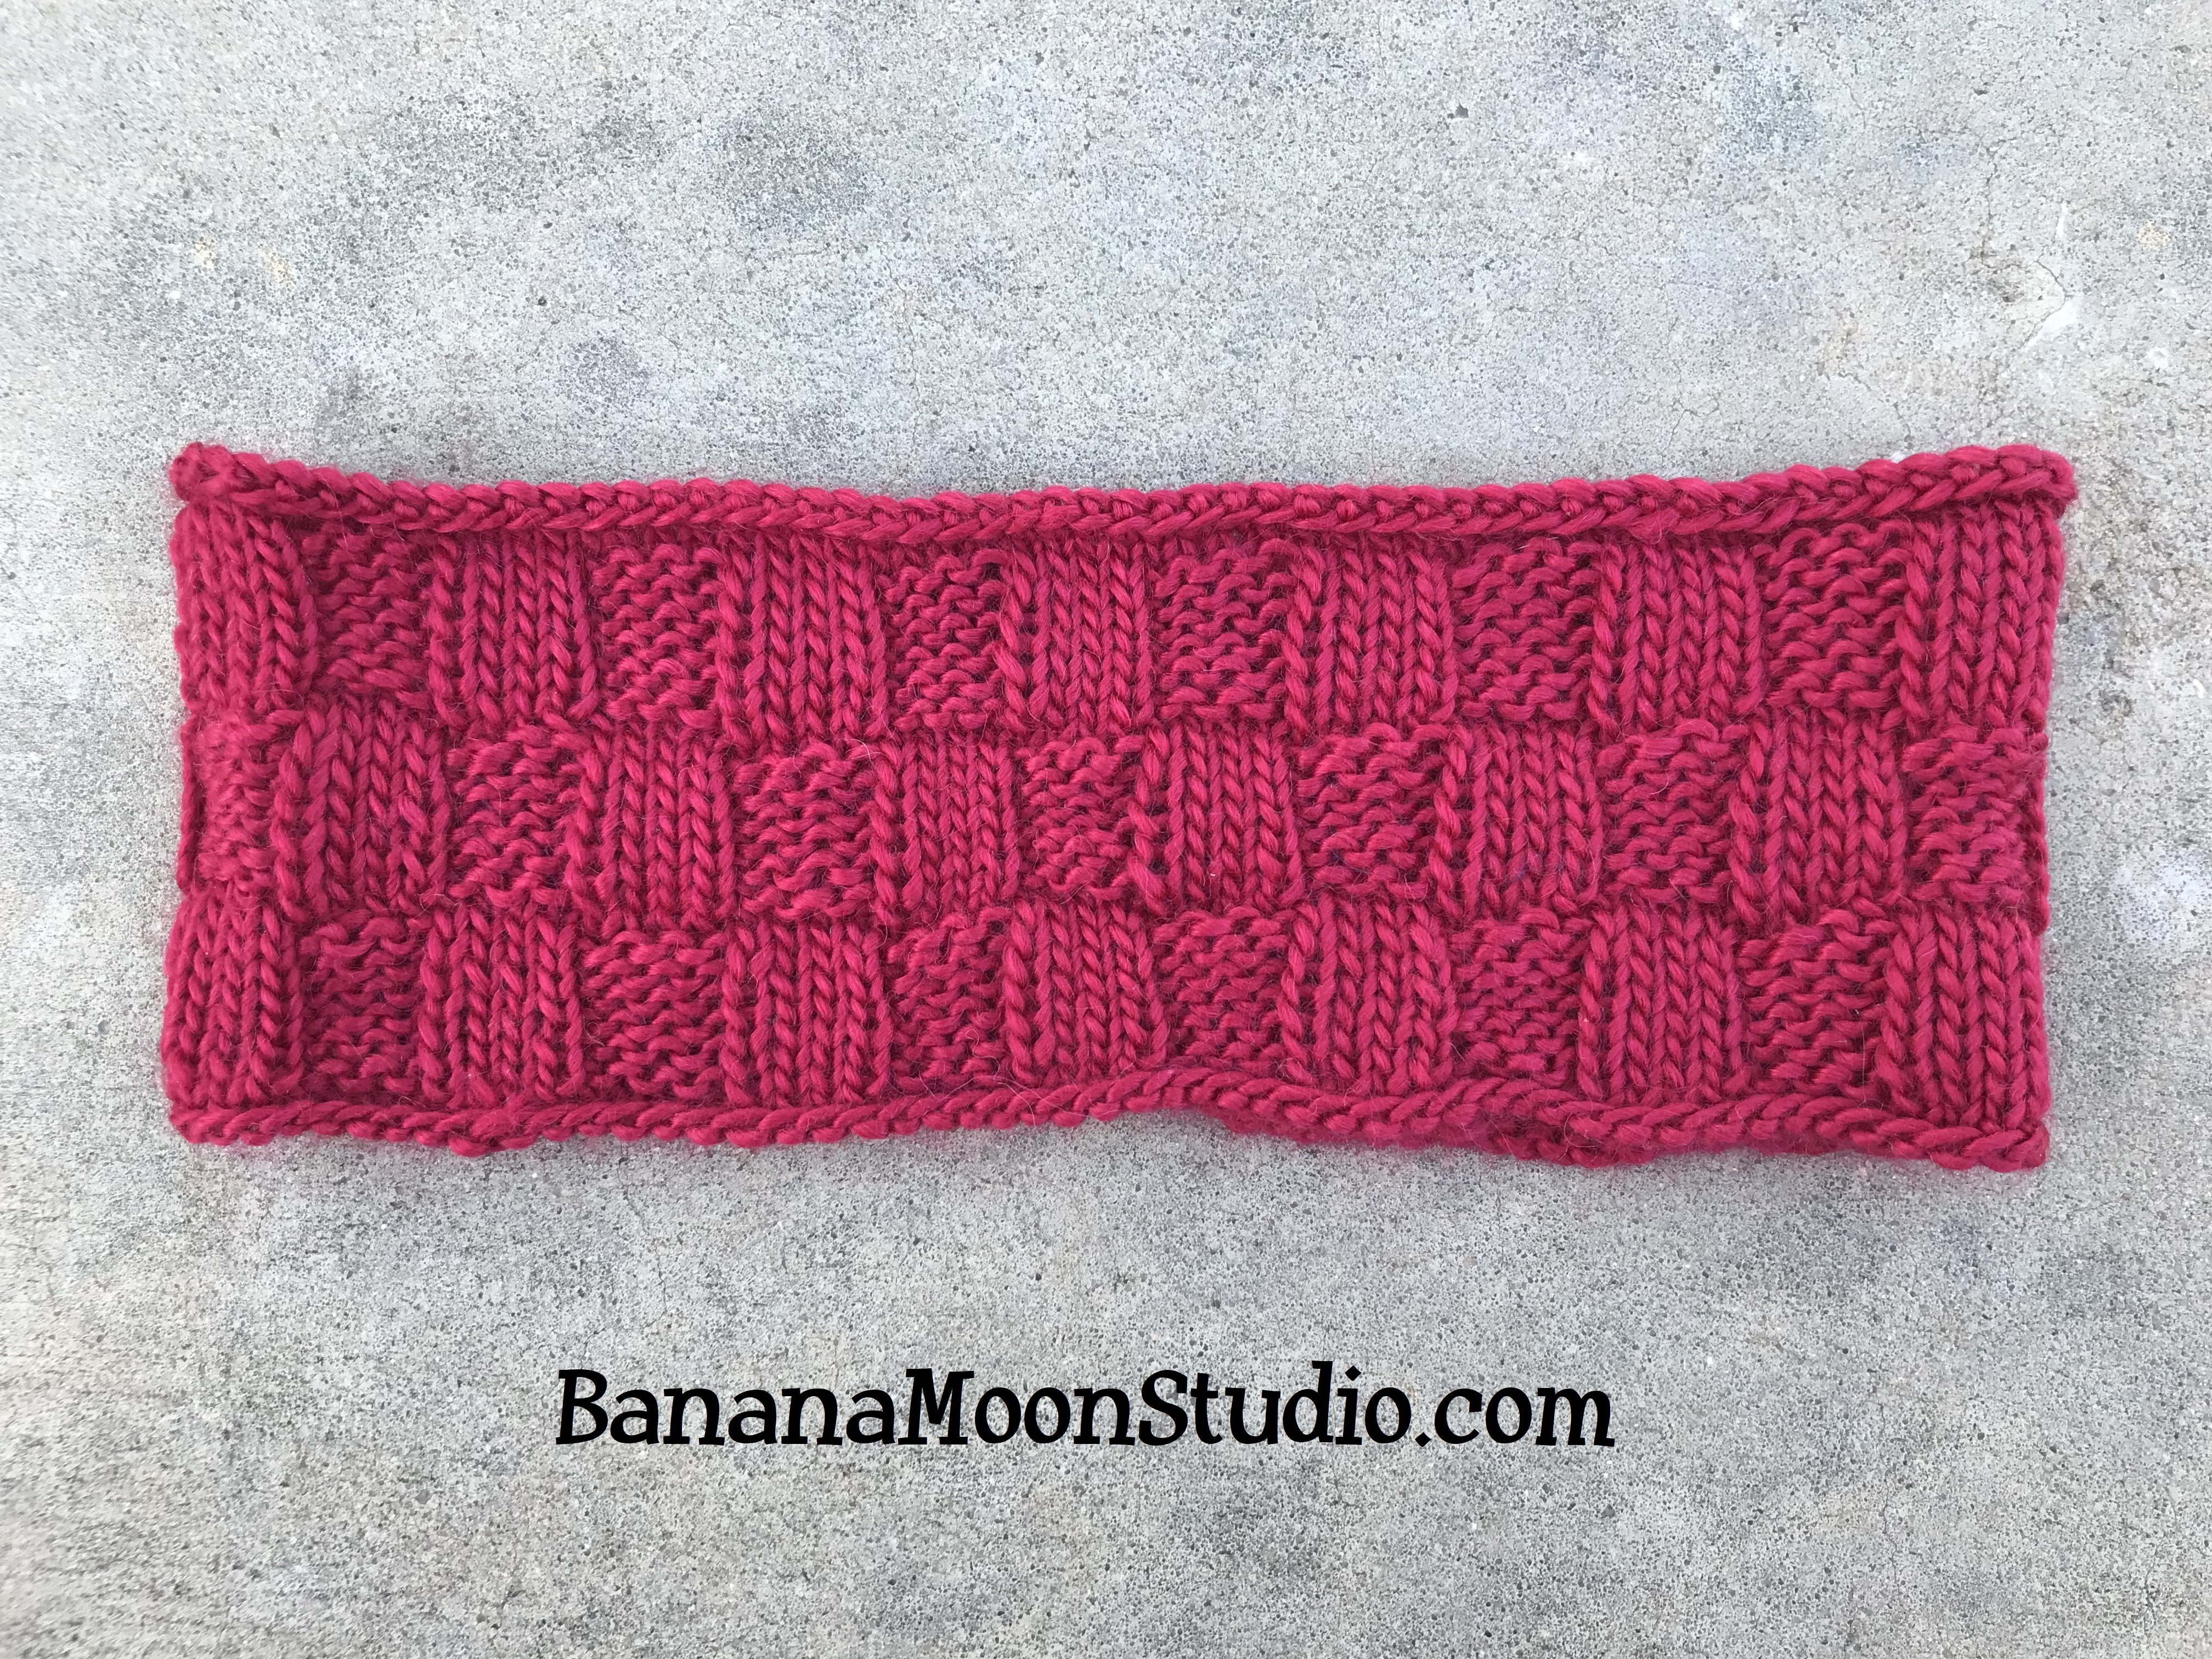 Yukon Headband, a free knitting pattern perfect for fall and football season, from Banana Moon Studio